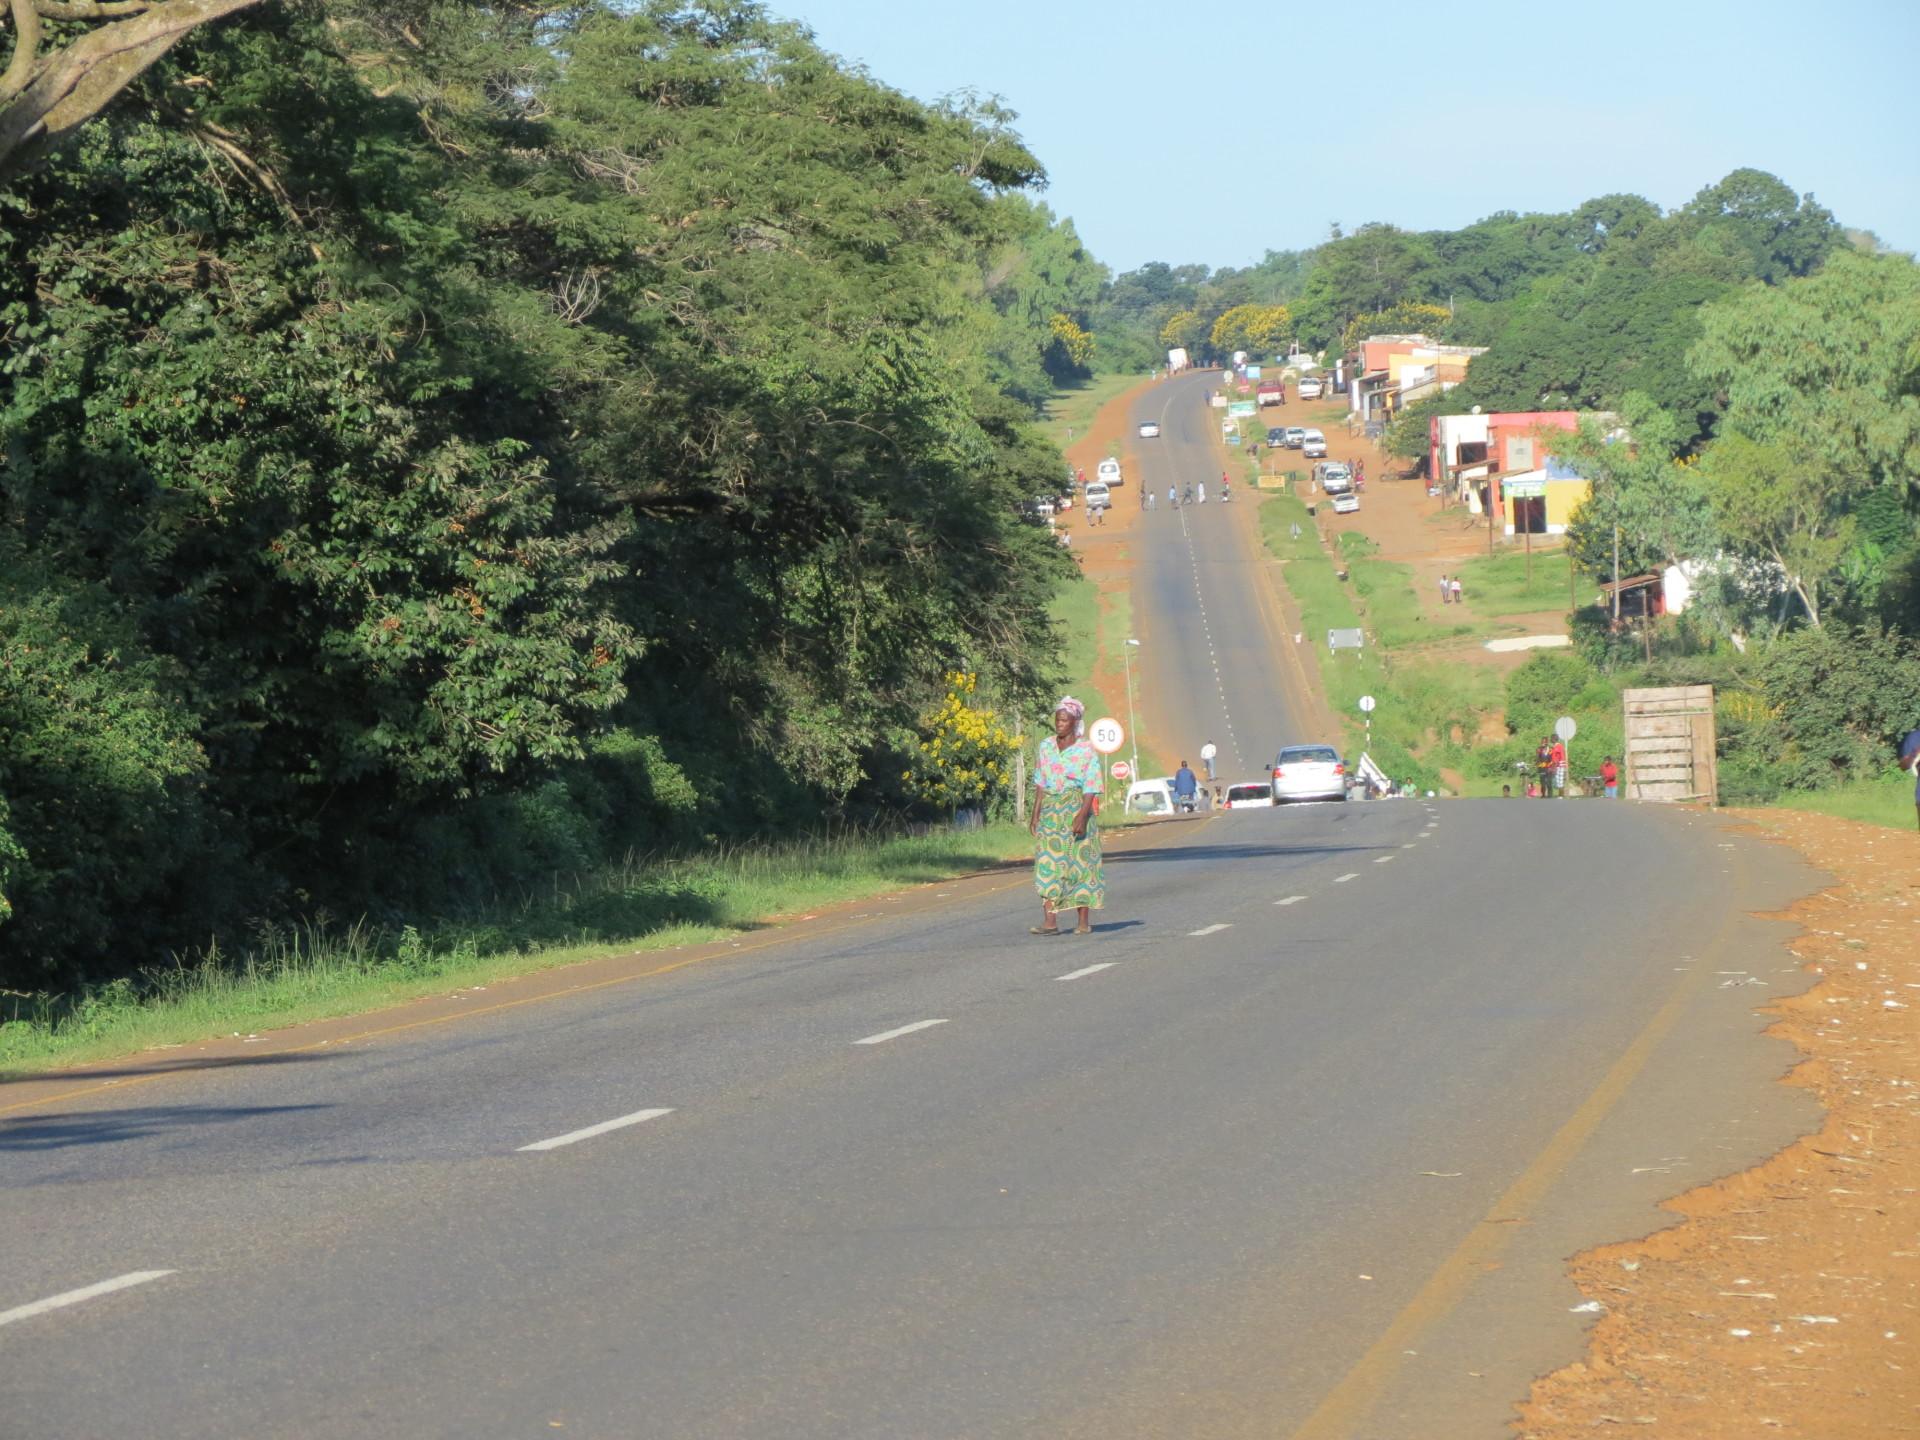 Lilongwe-Mchinji Road